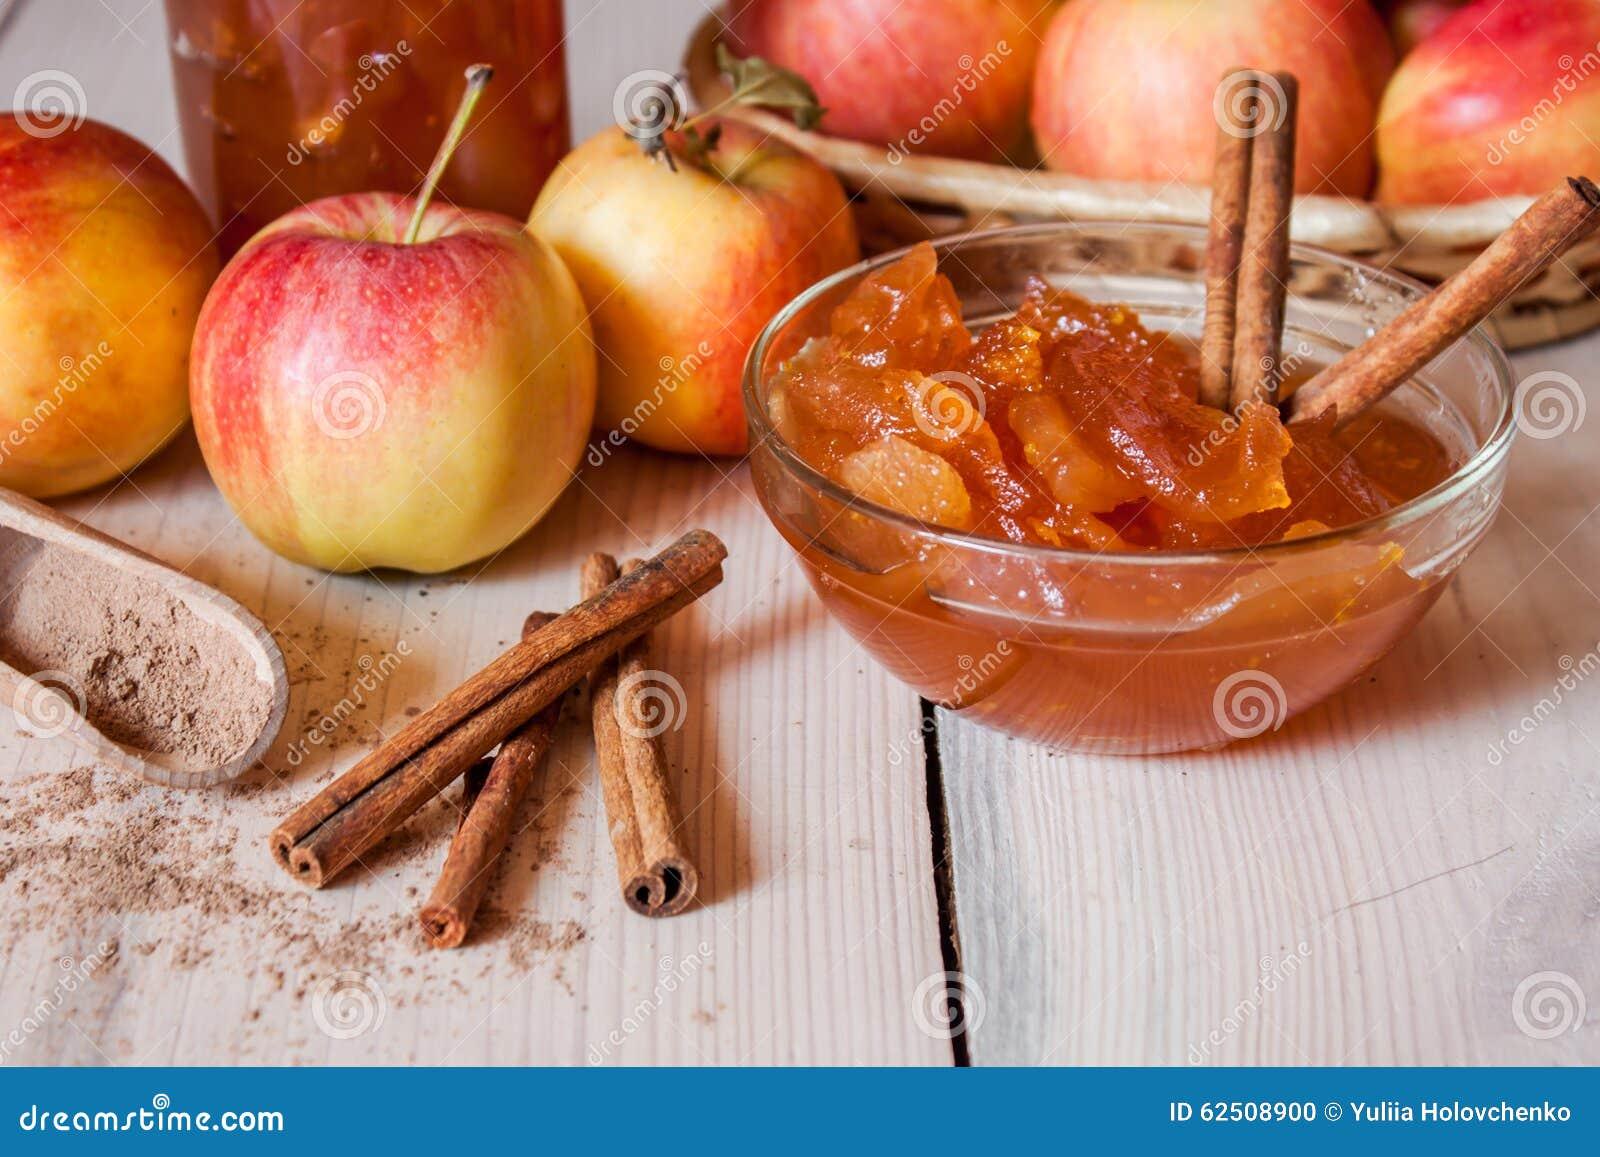 how to make apple cinnamon jam